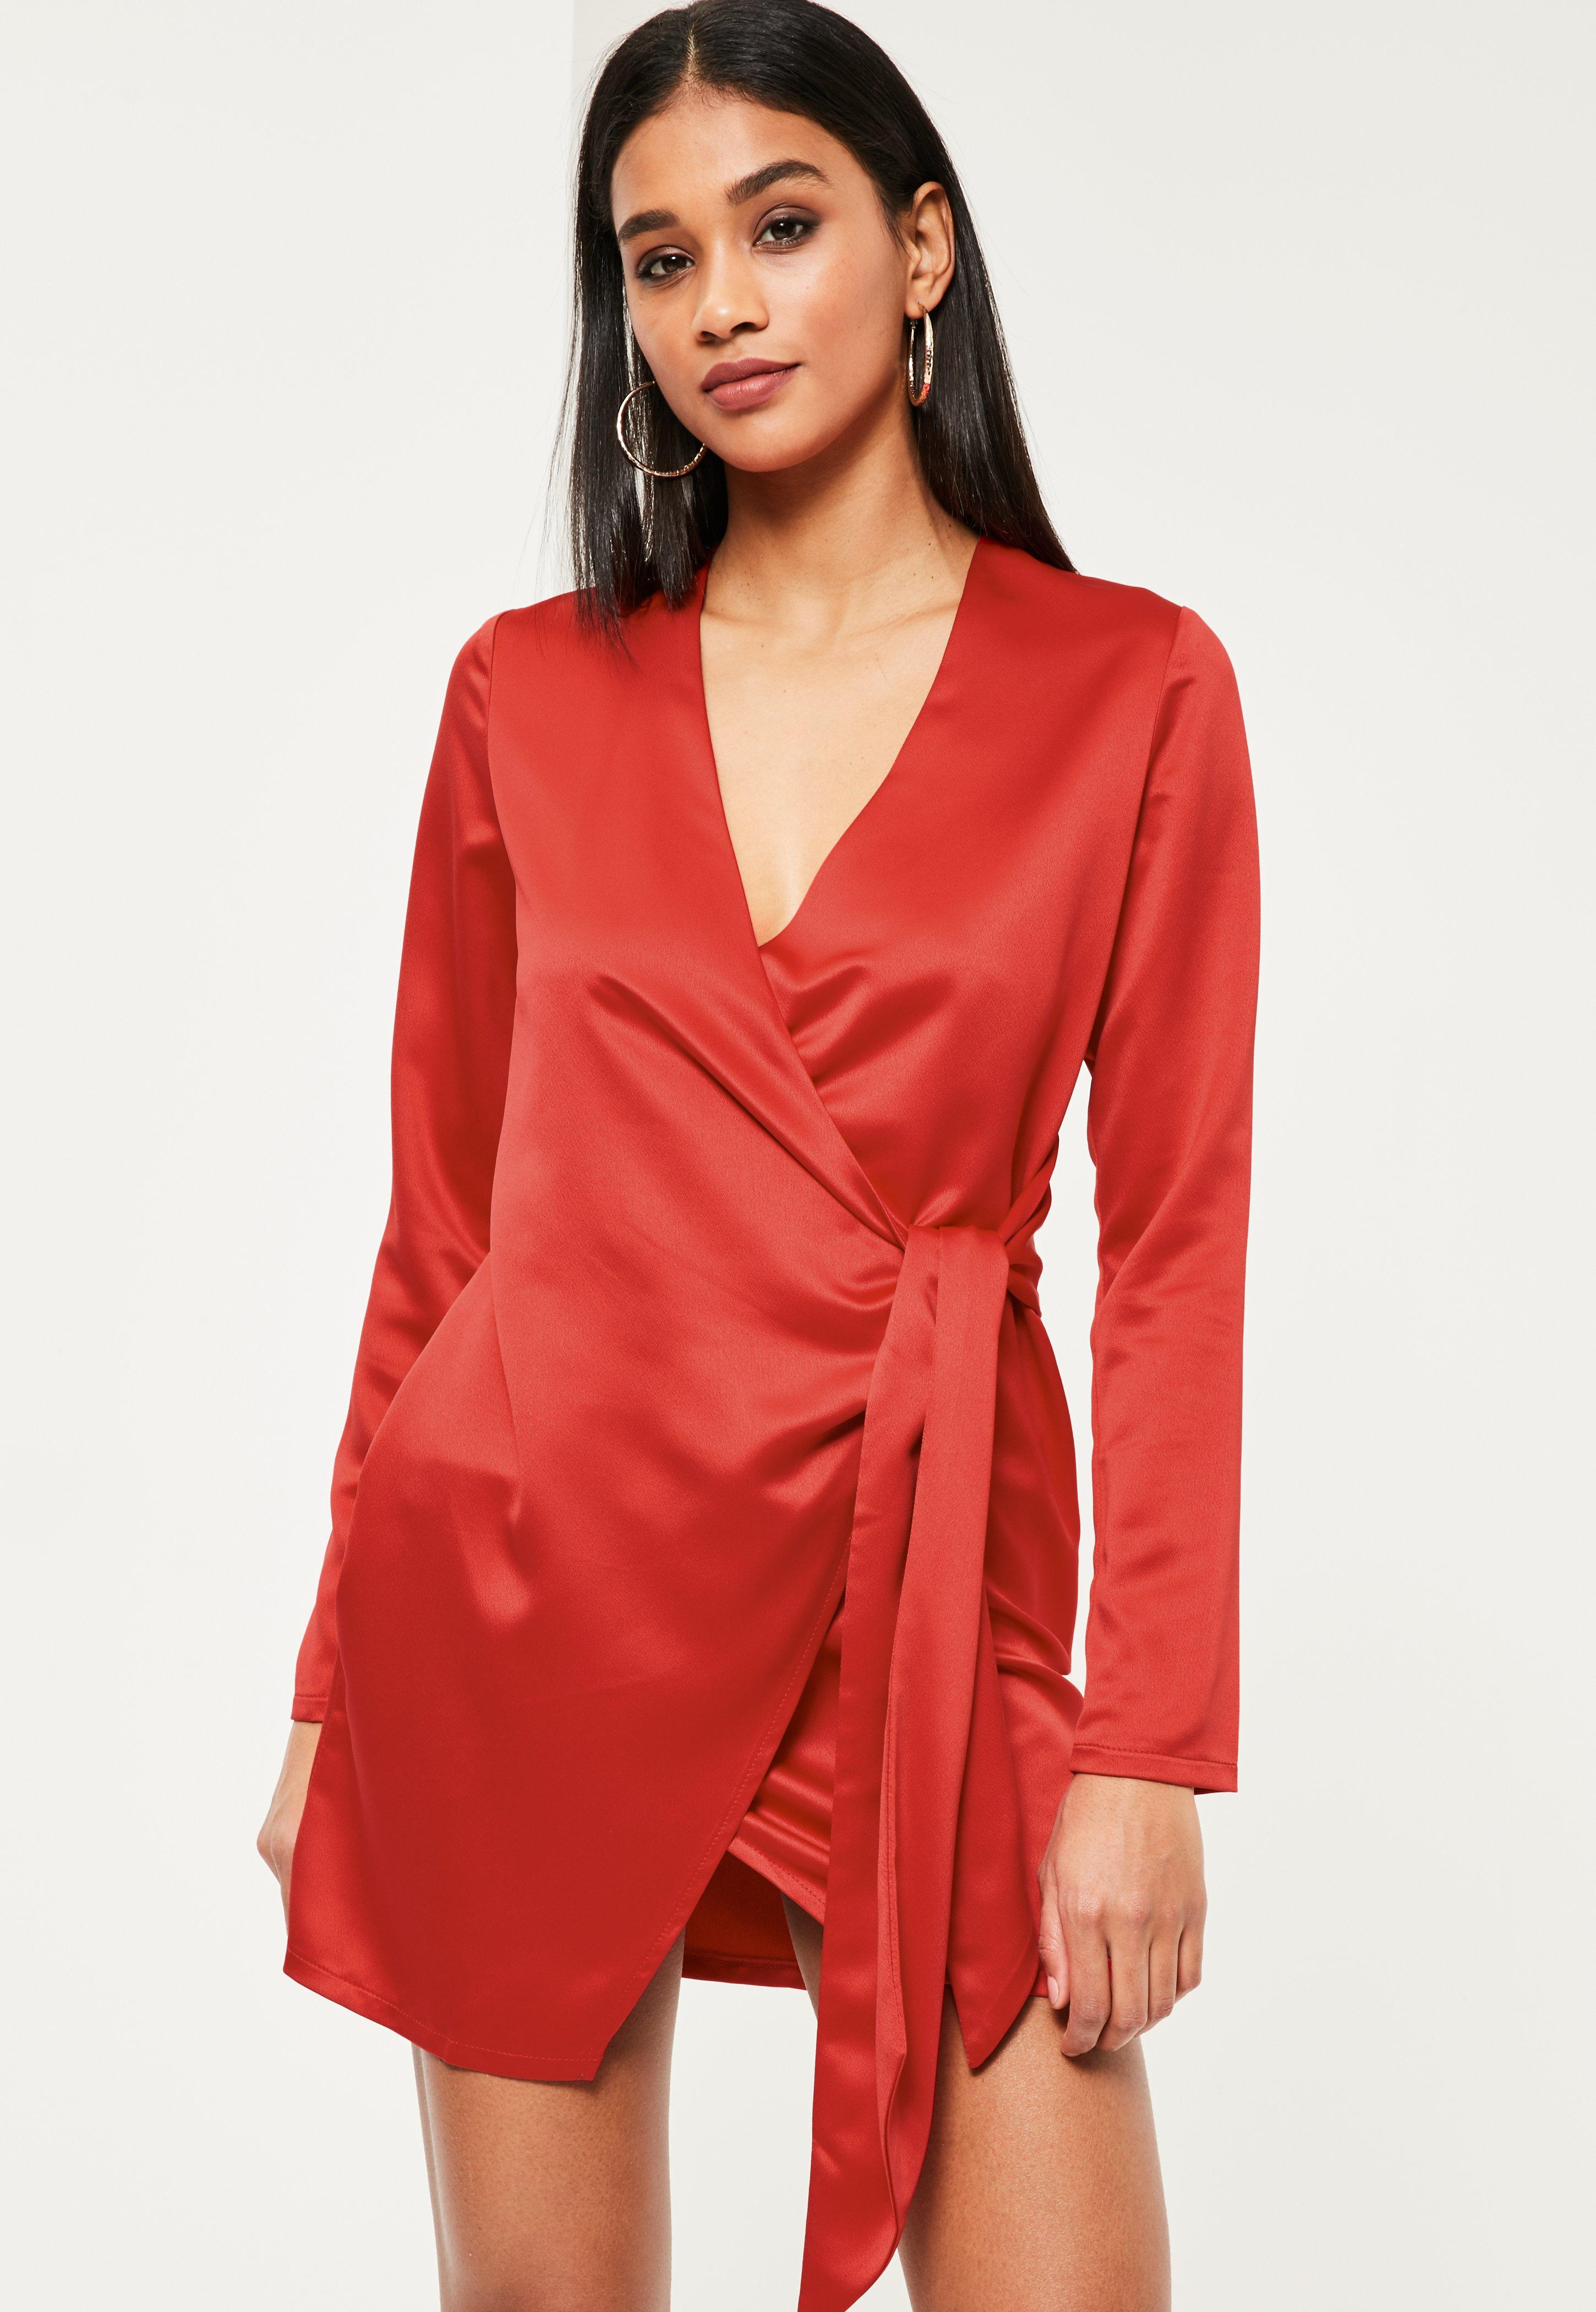 Red Silky Wrap Tie Waist Shirt Dress